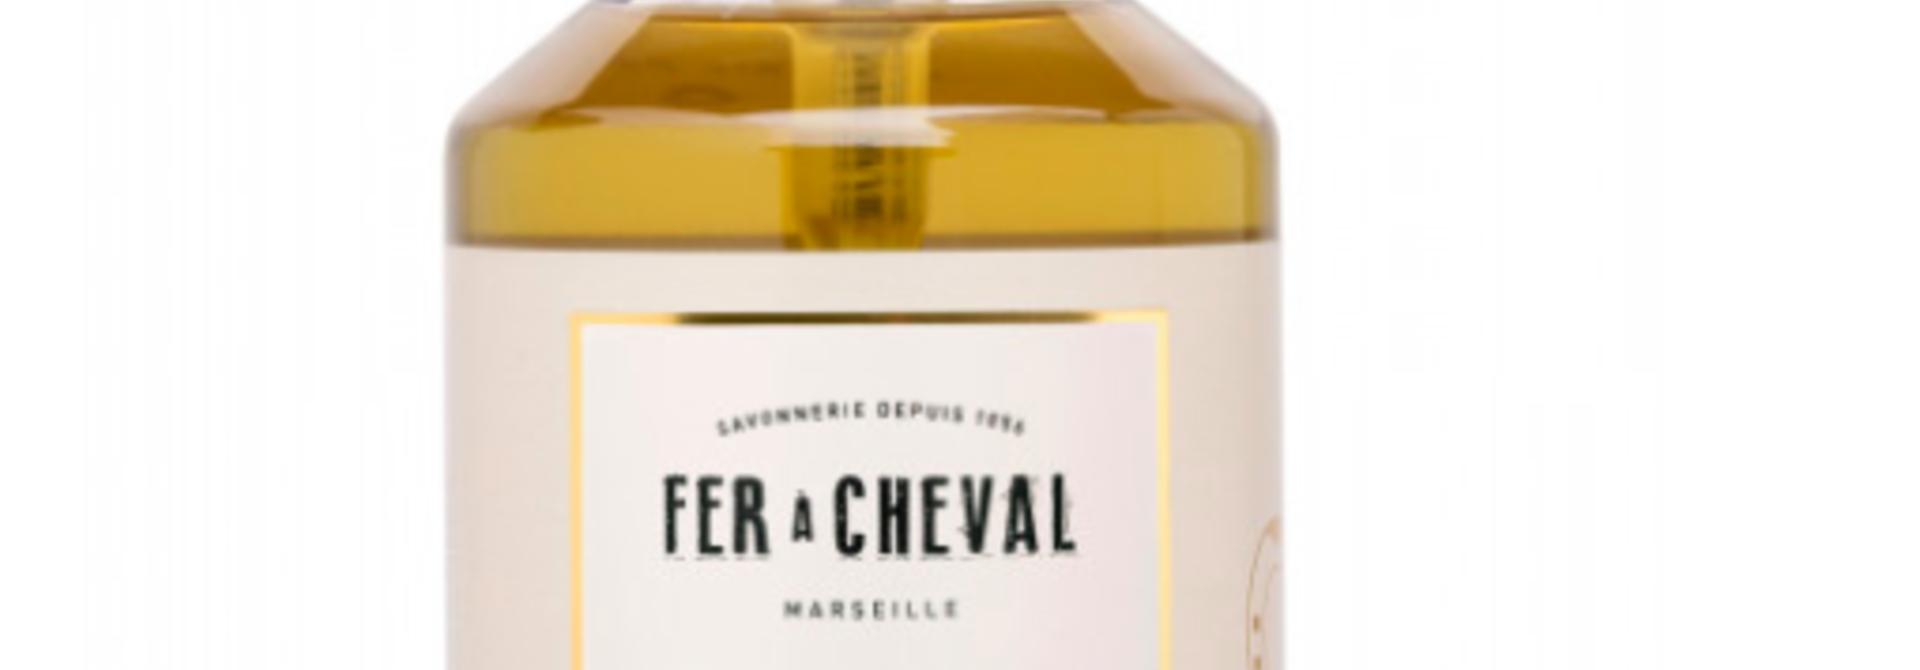 Premium Vloeibare Marseille zeep 500ml